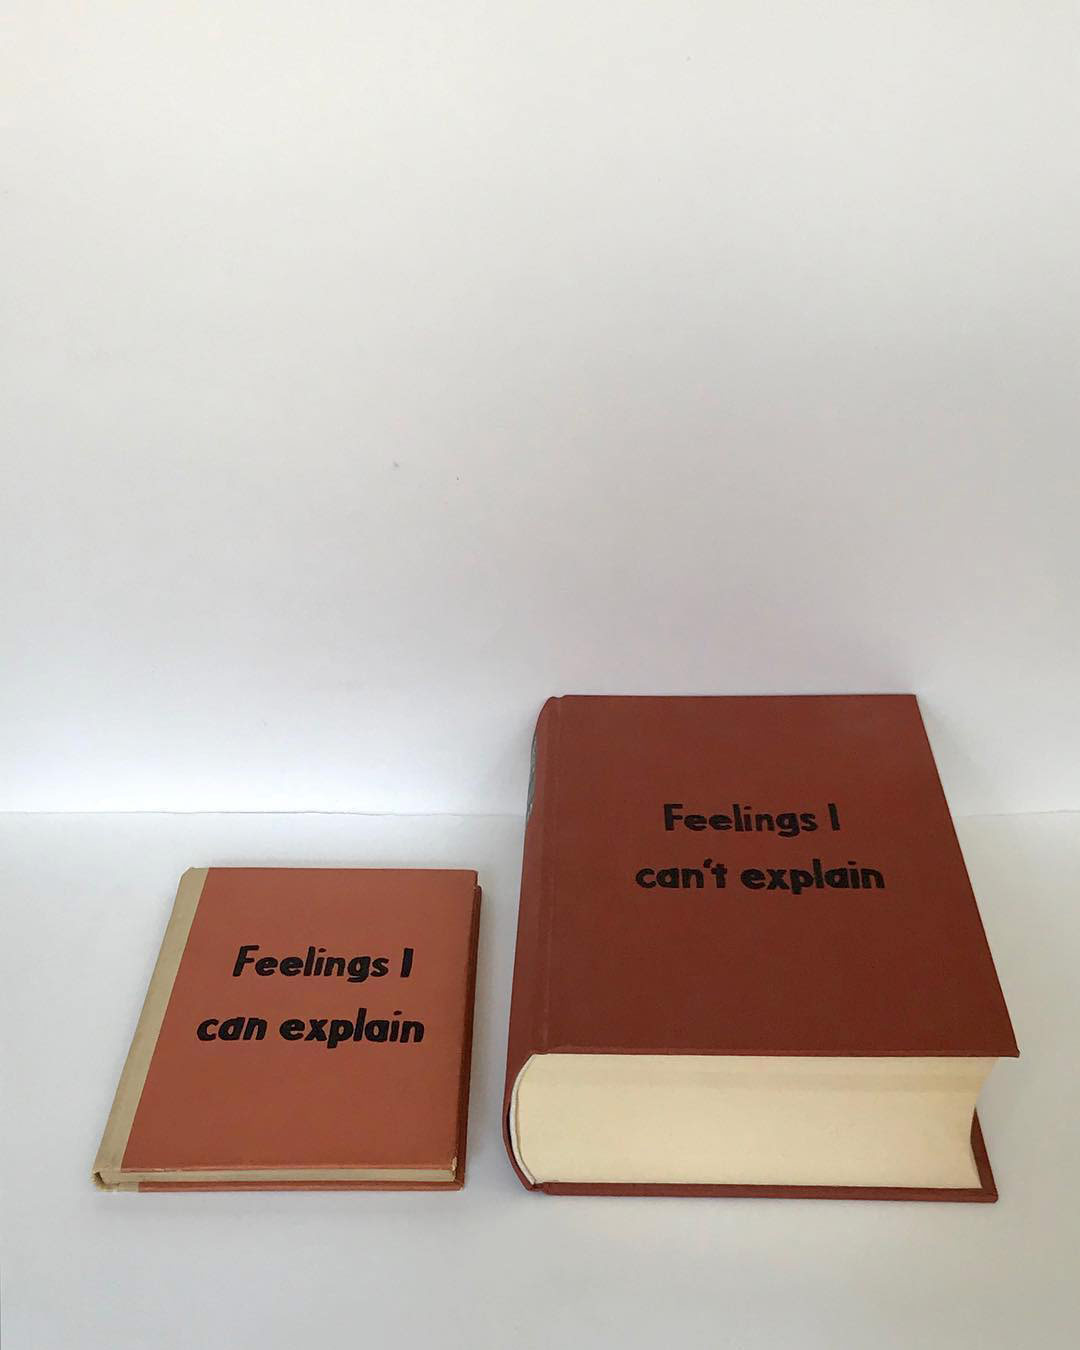 Gli ironici self-help book di Johan Deckmann   Collater.al 12